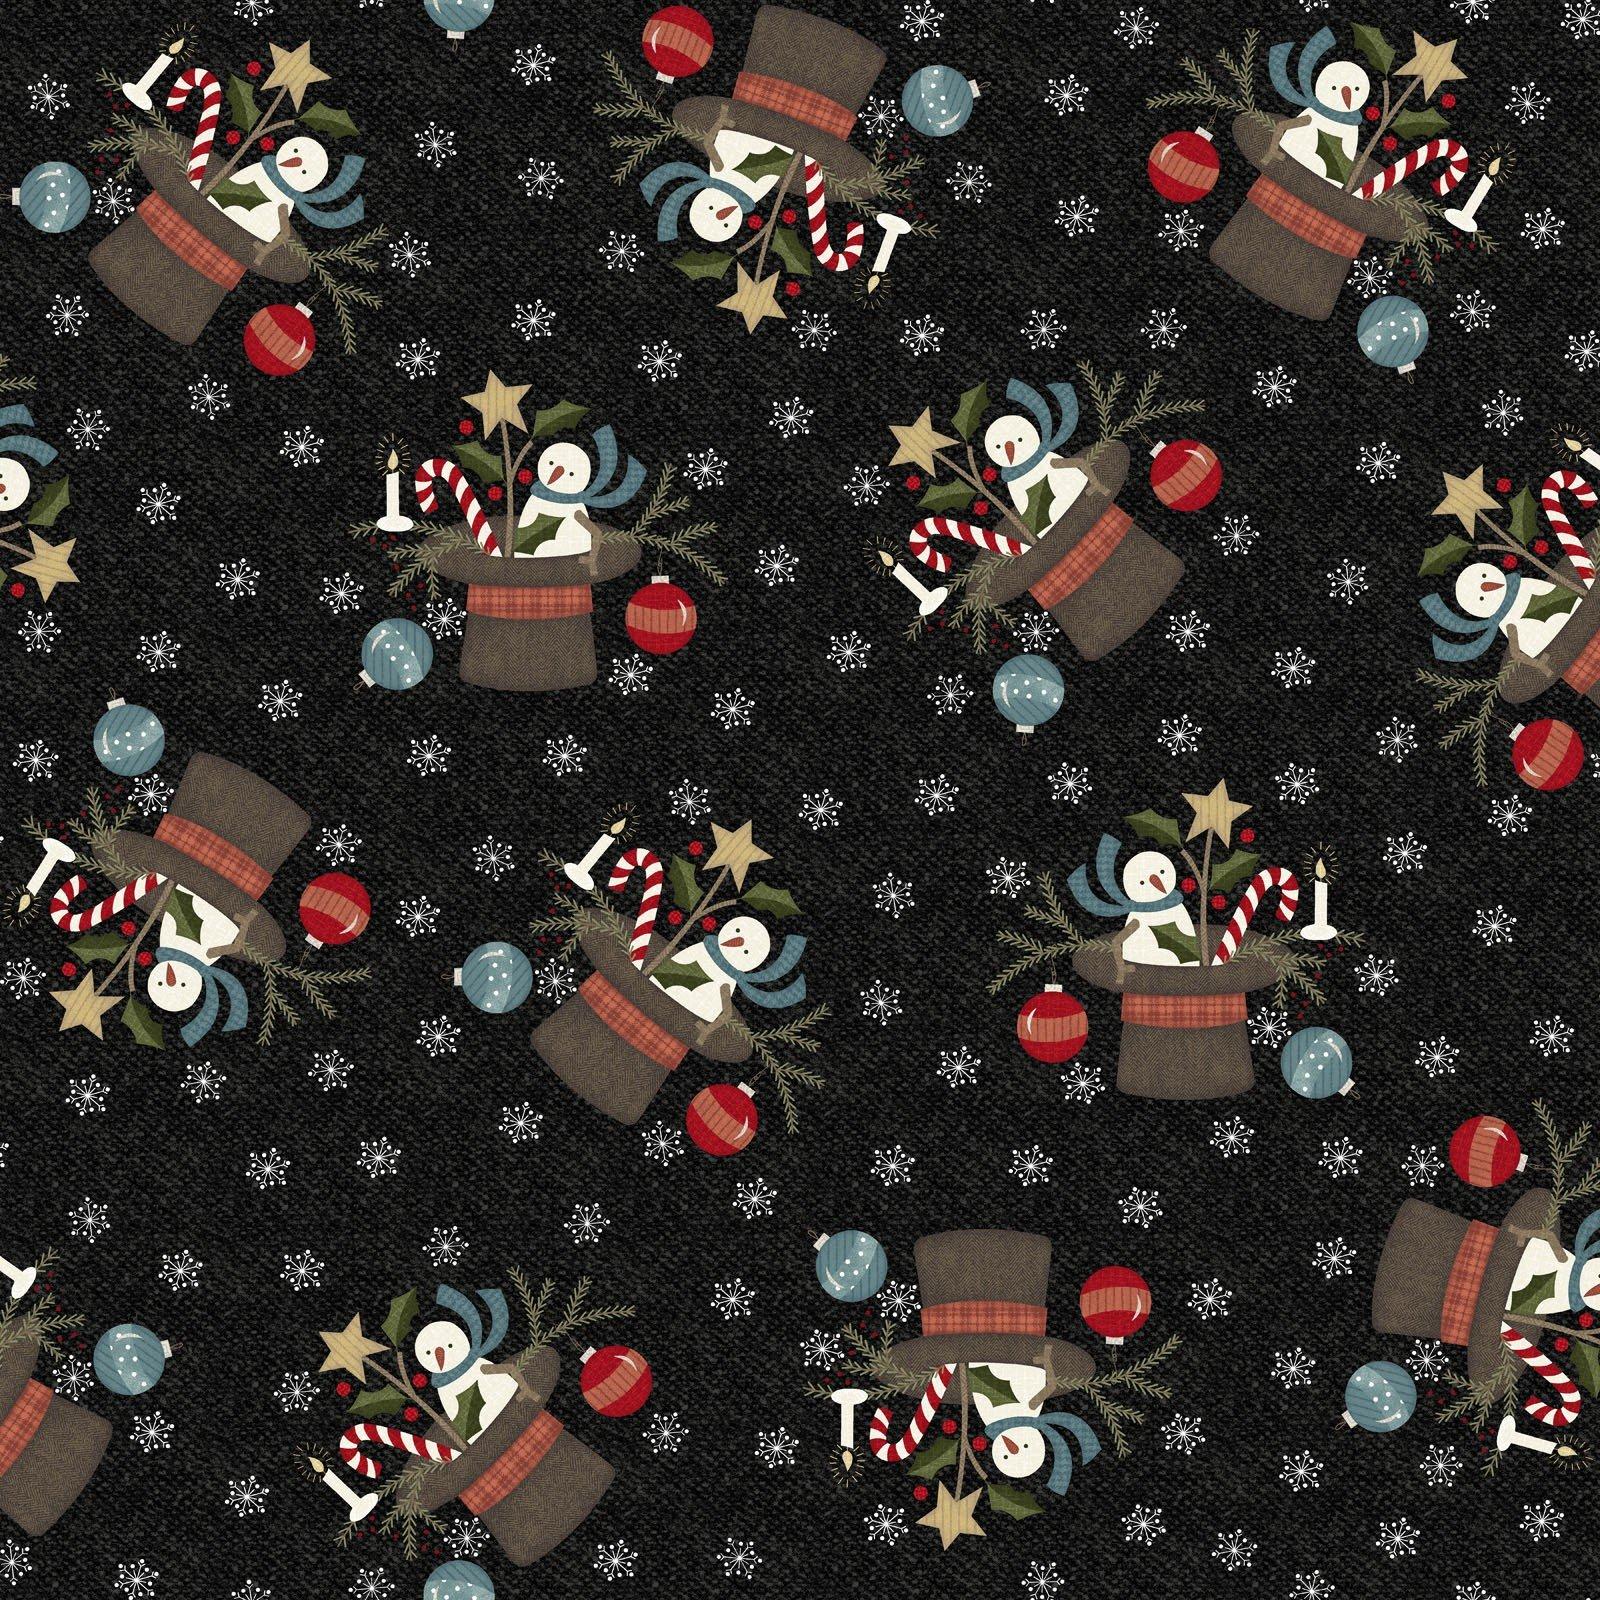 Charcoal Santa Hat - Snowdays Flannel by Bonnie Sullivan - MASF9933-JK